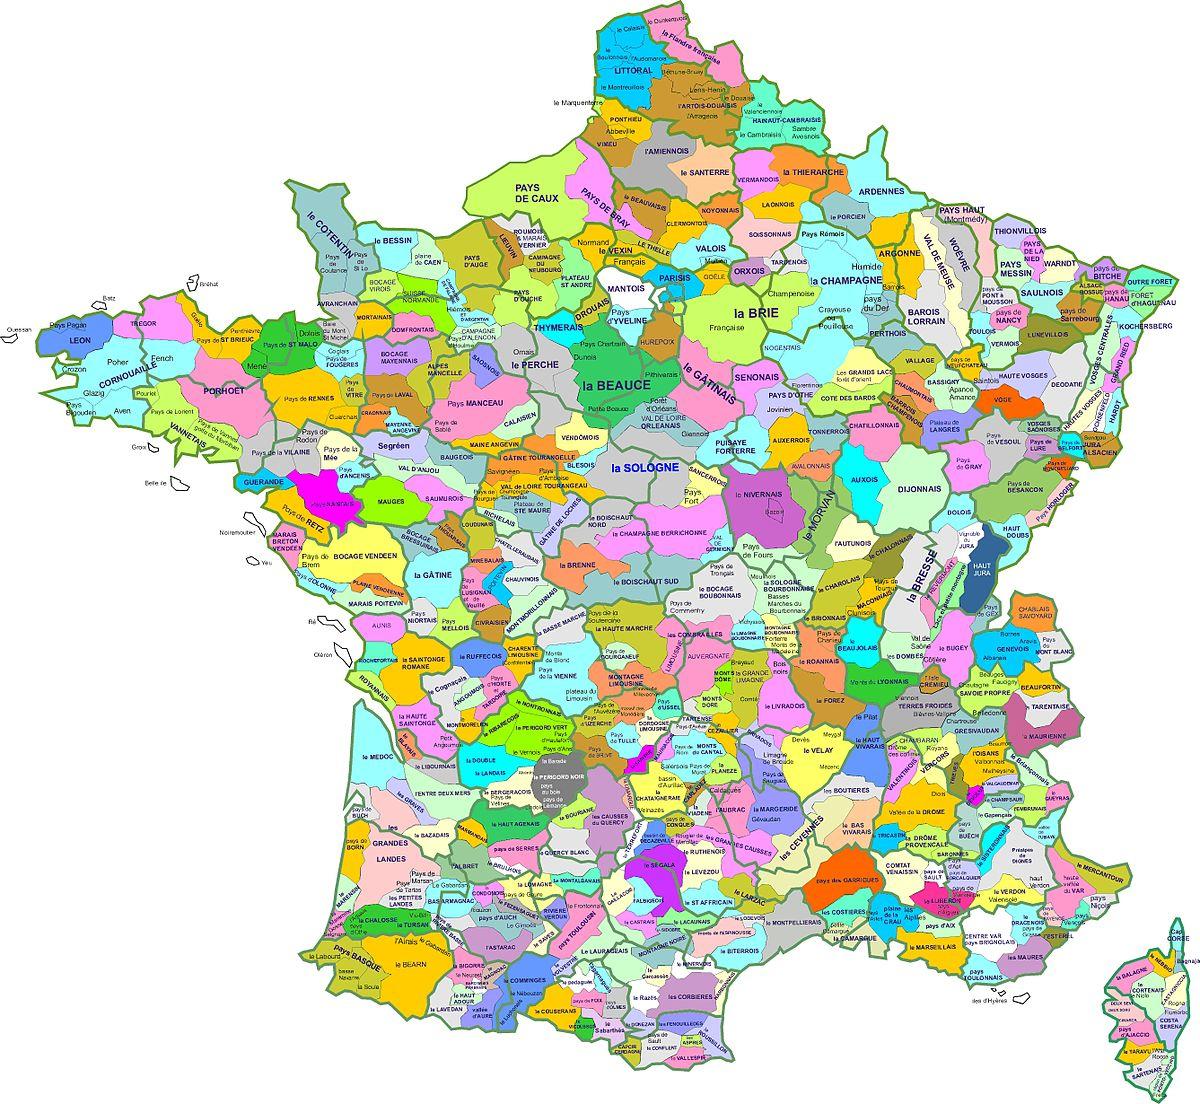 Natural Region Of France - Wikidata concernant Carte Des Régions De France Vierge